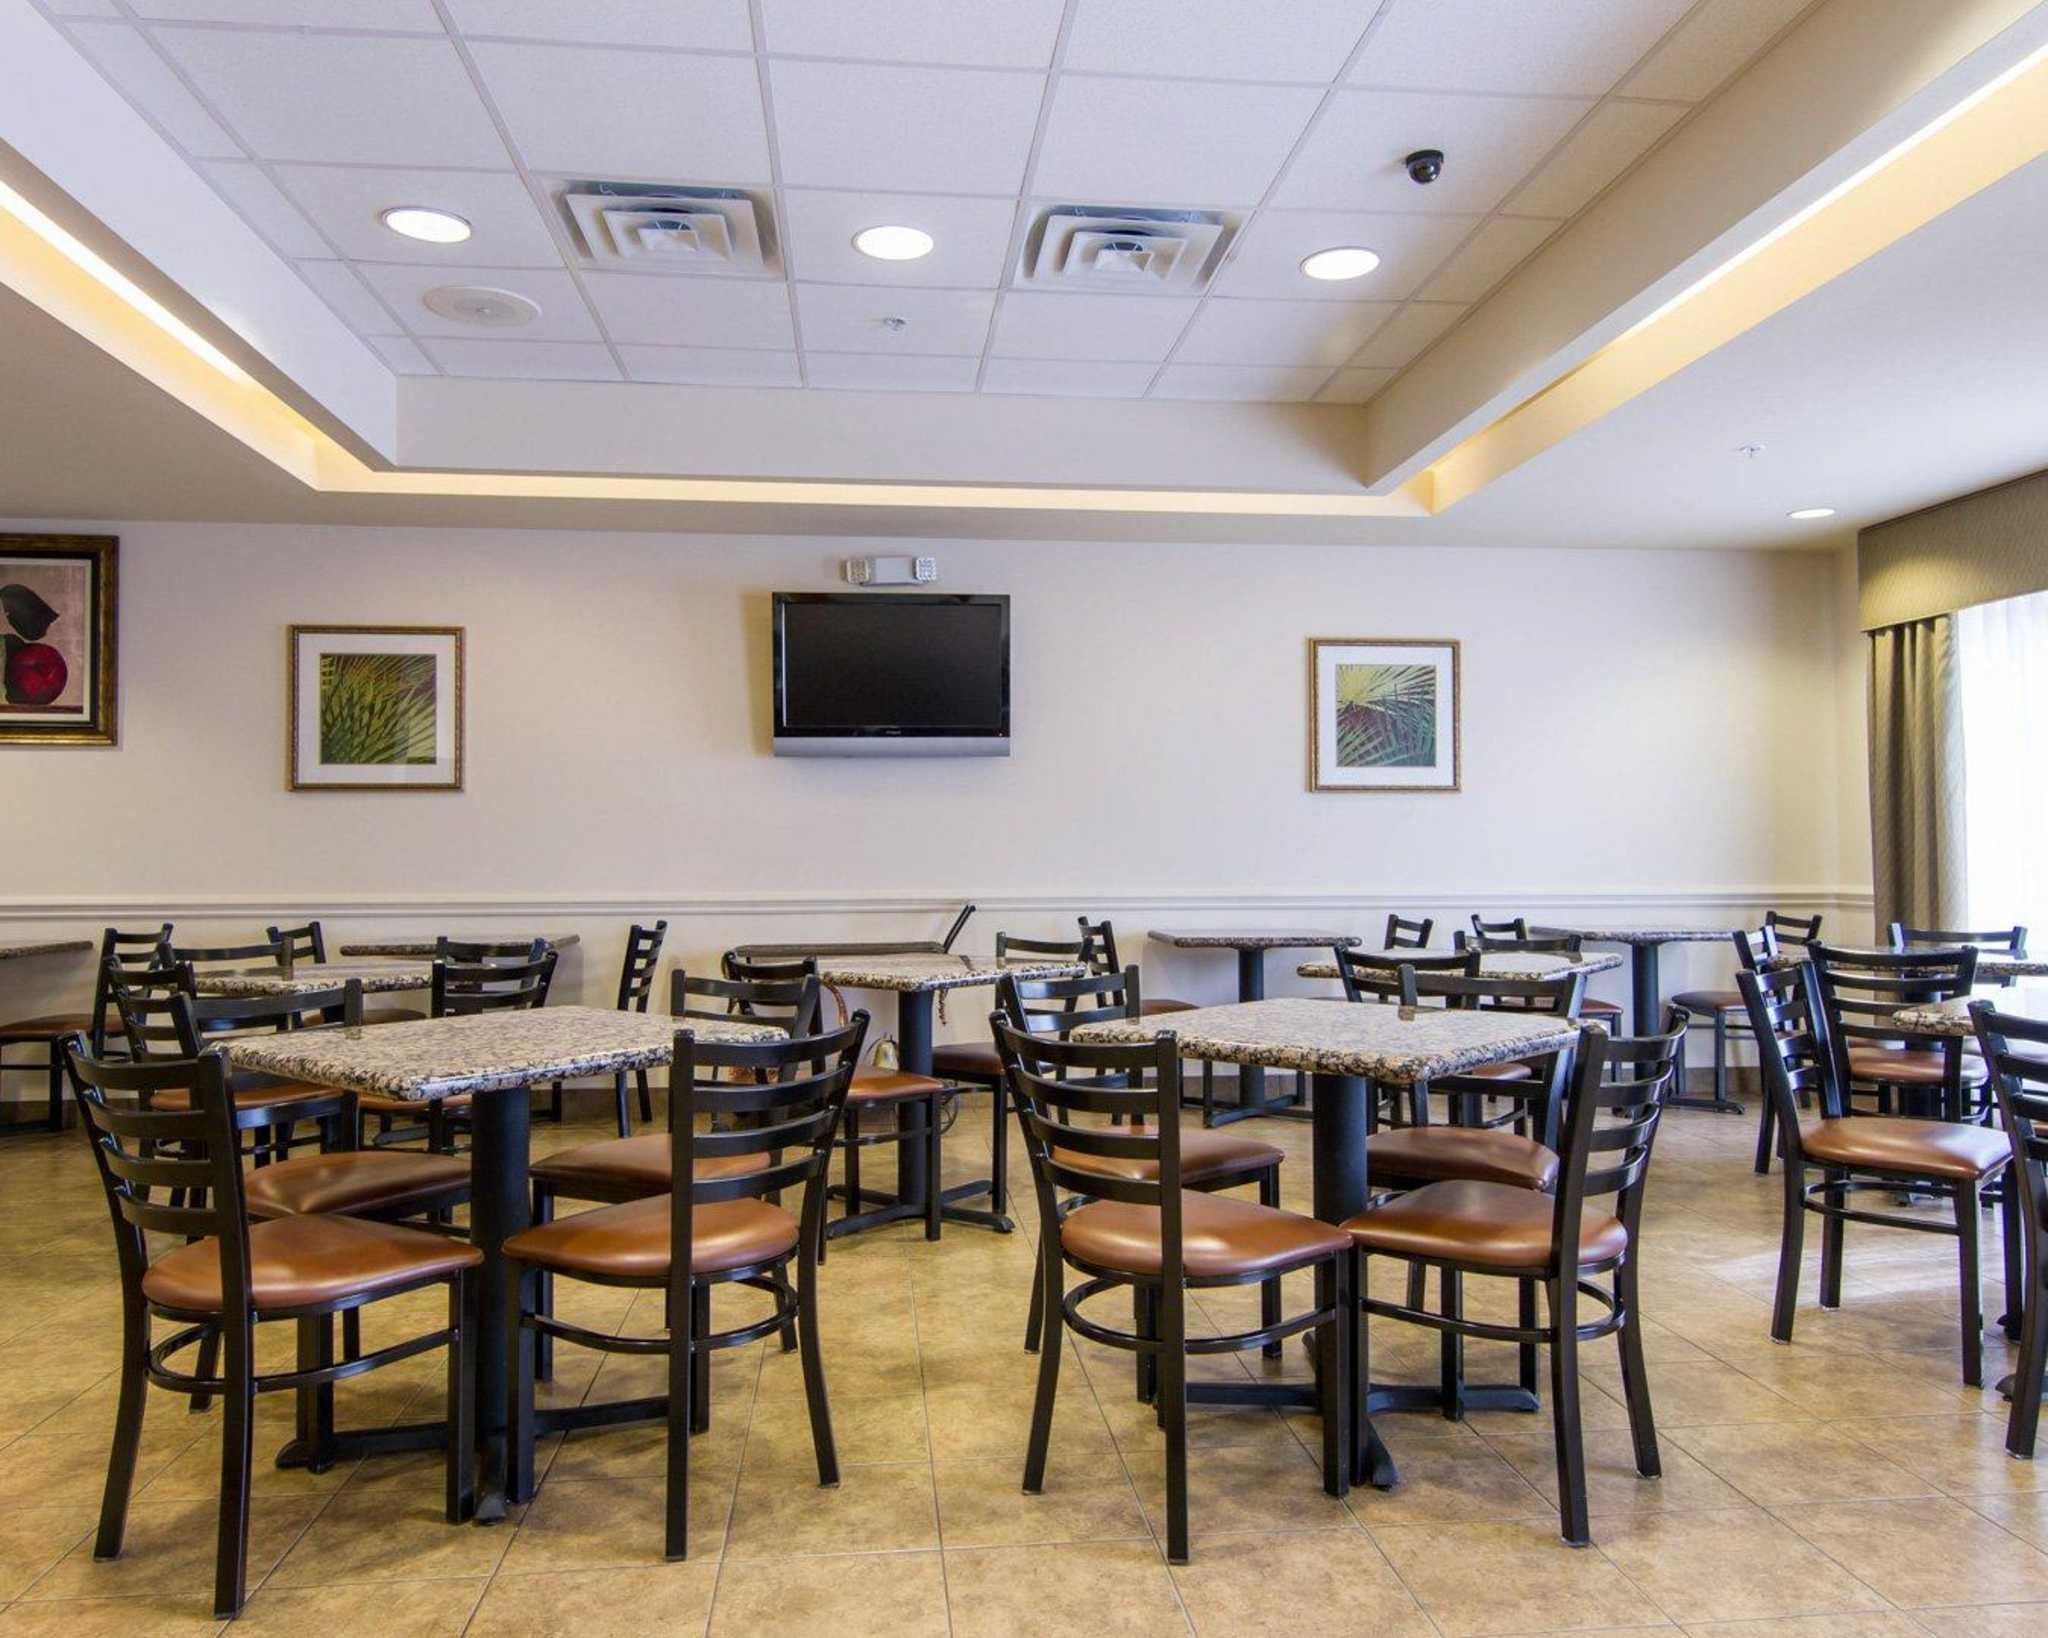 Comfort Inn & Suites Airport image 22